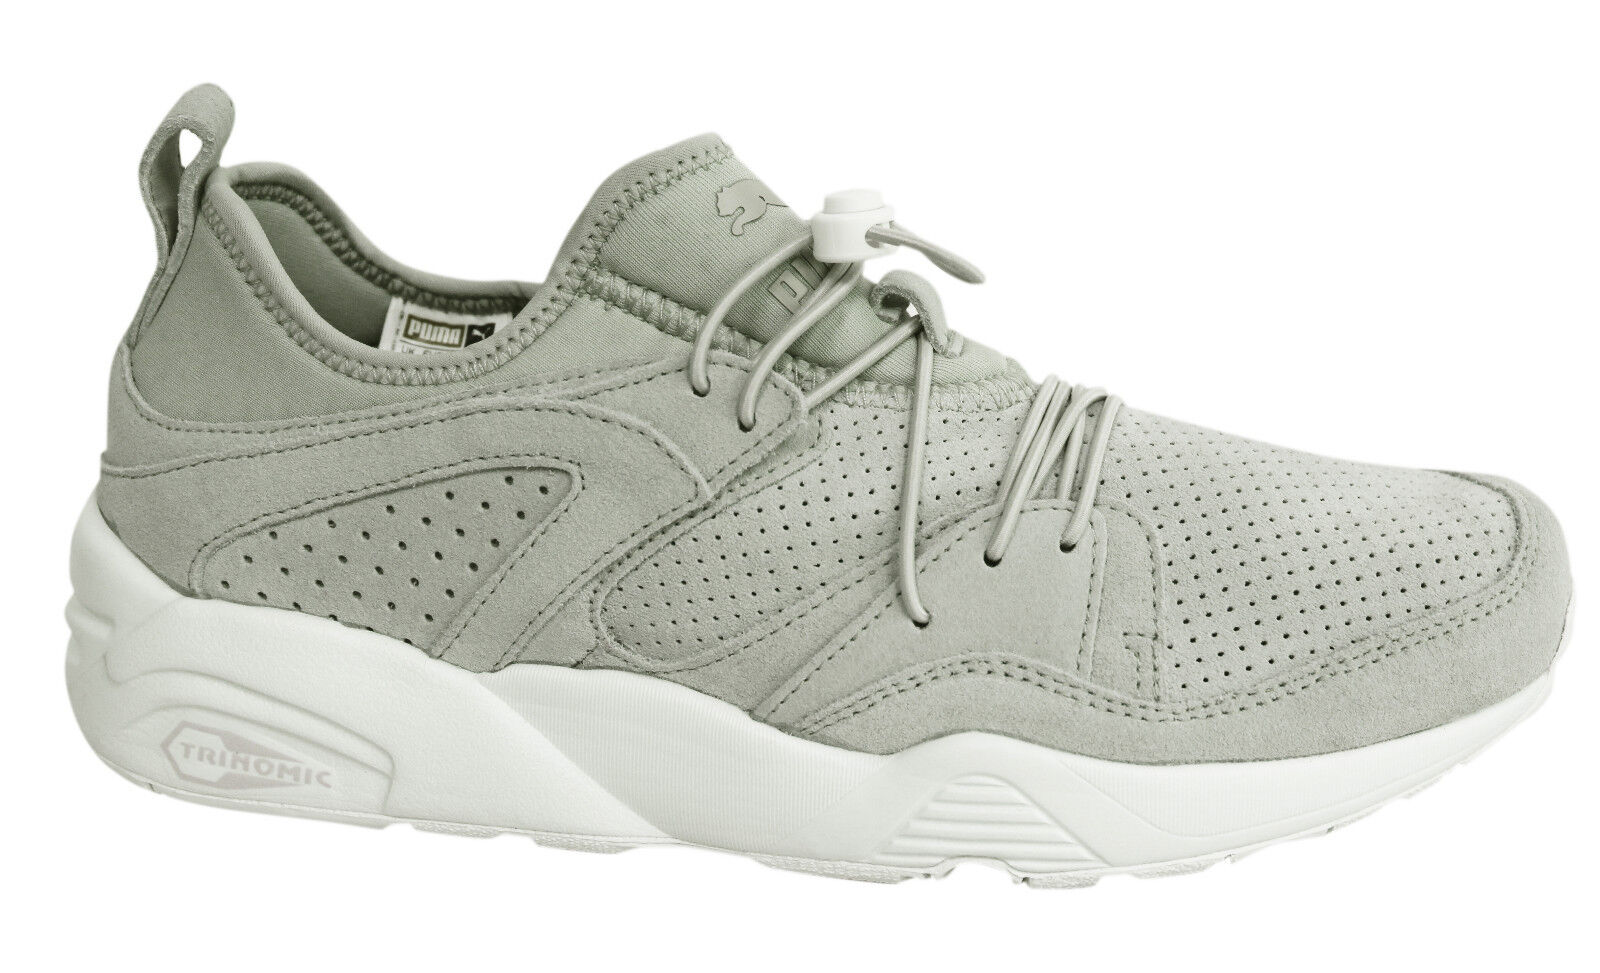 Puma Trinomic Blaze of Glory Soft Mens Grey Trainers Shoes 360101 07 U126